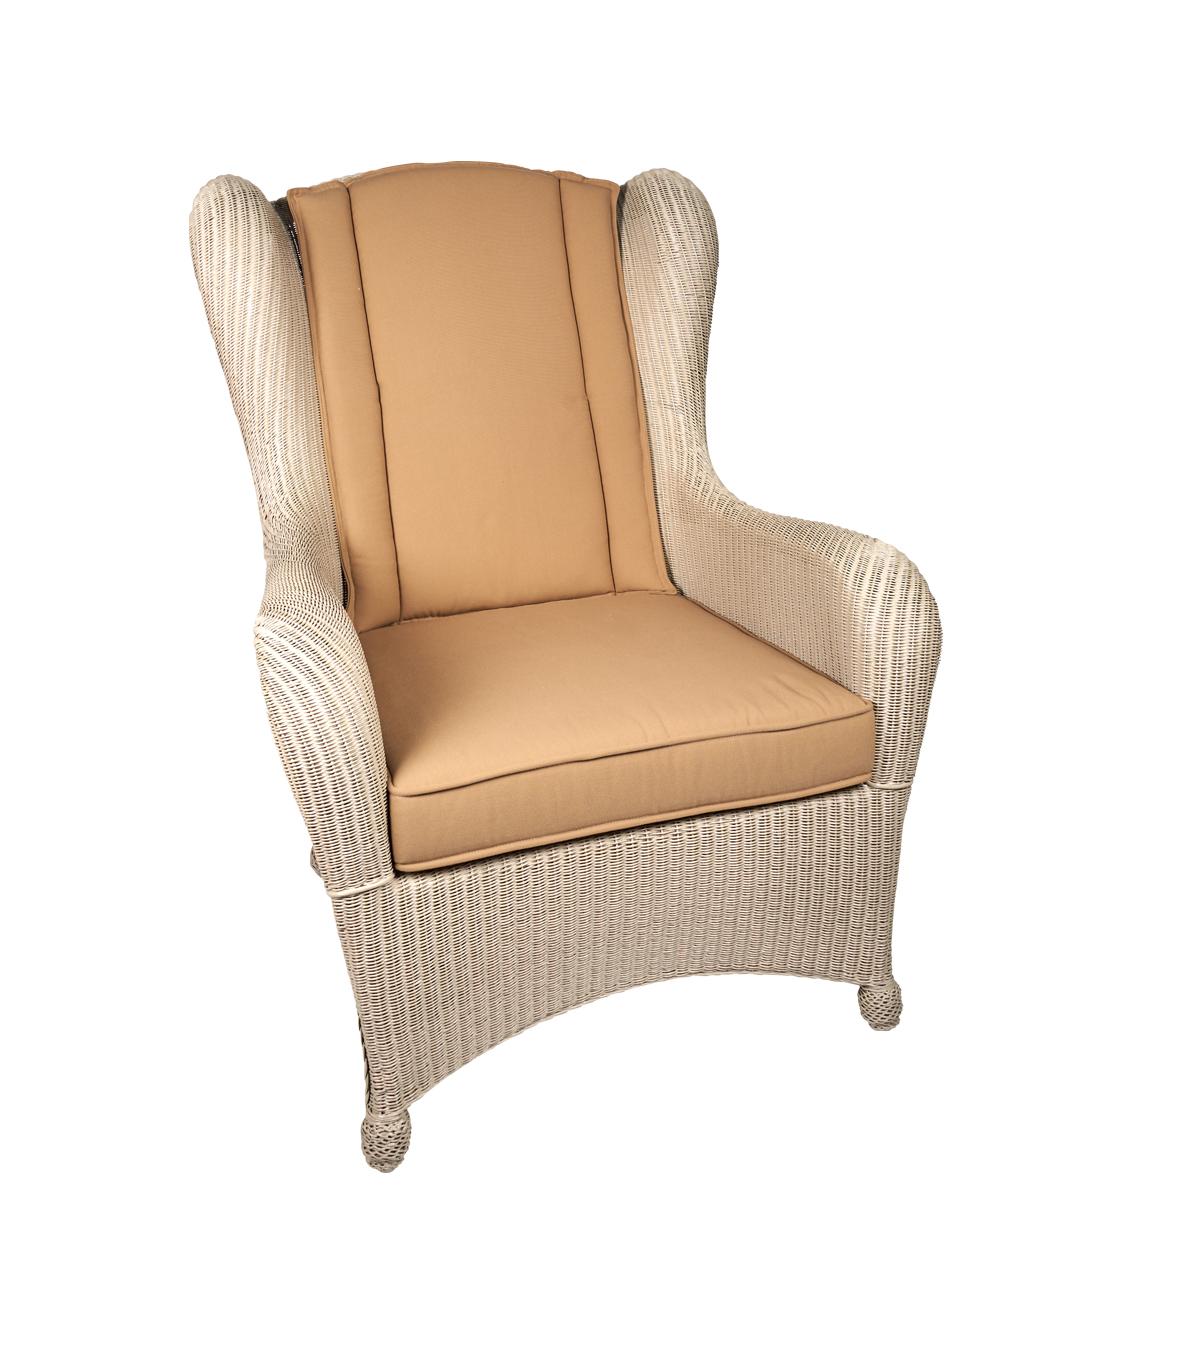 Lloyd loom King Chair Parel Wit